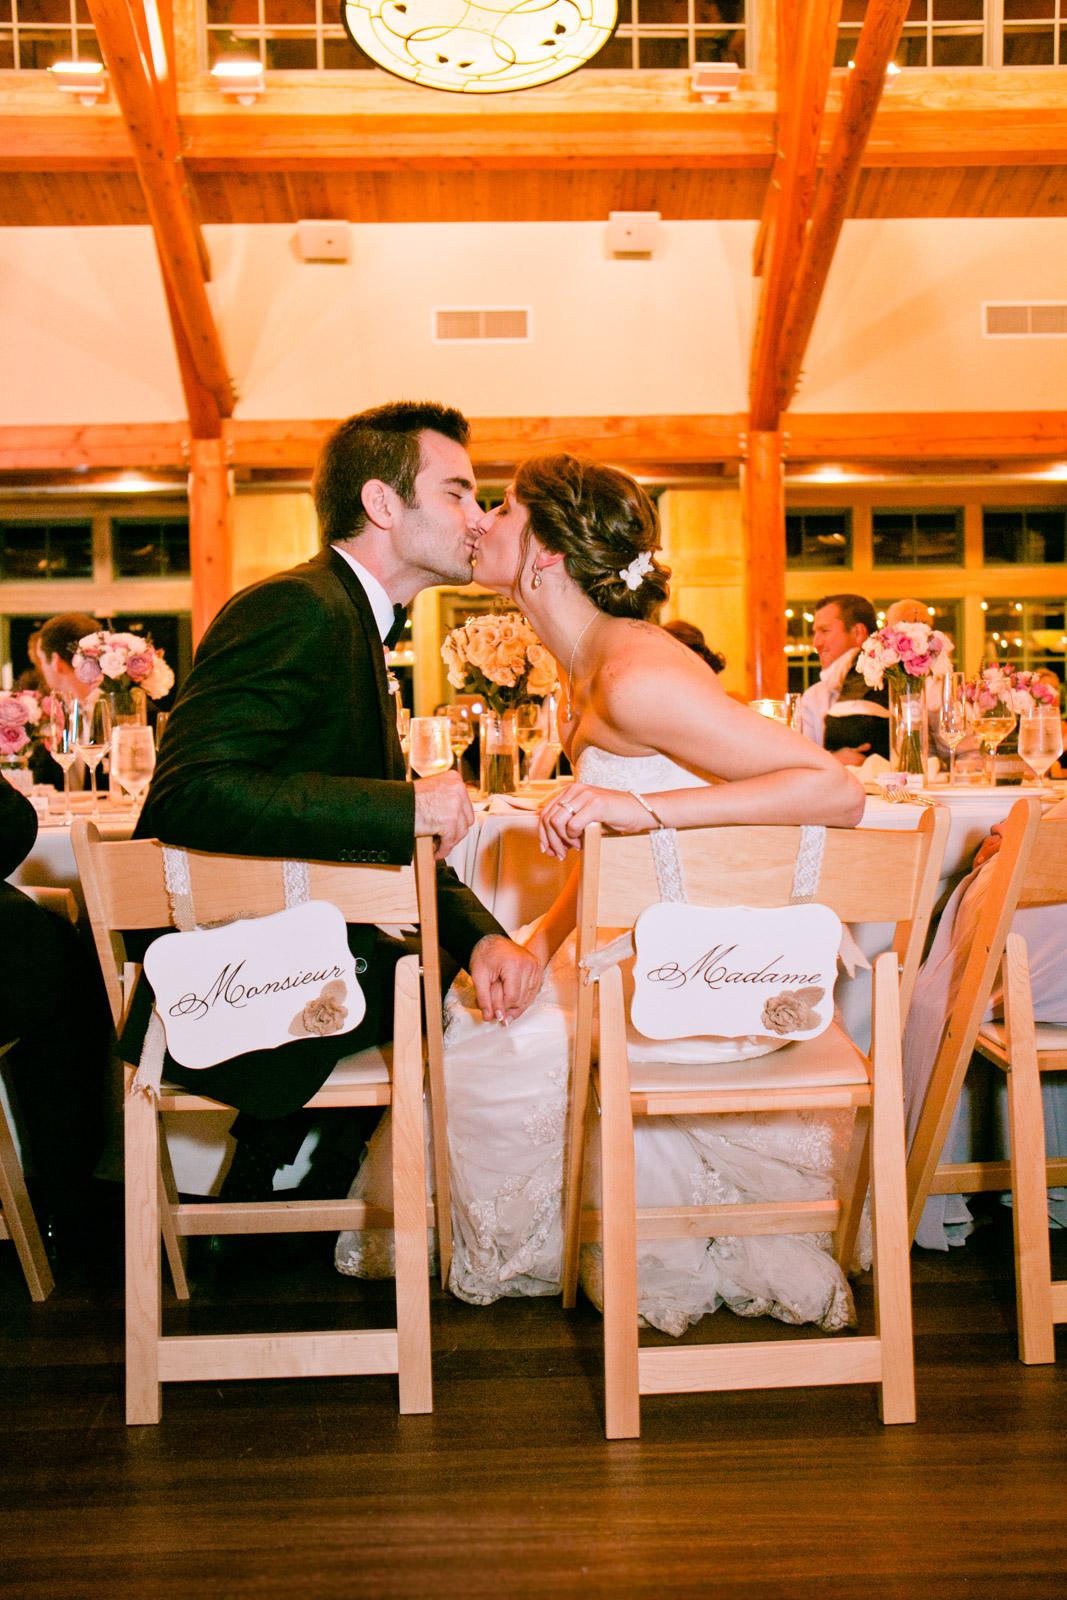 wedding reception decor ideas